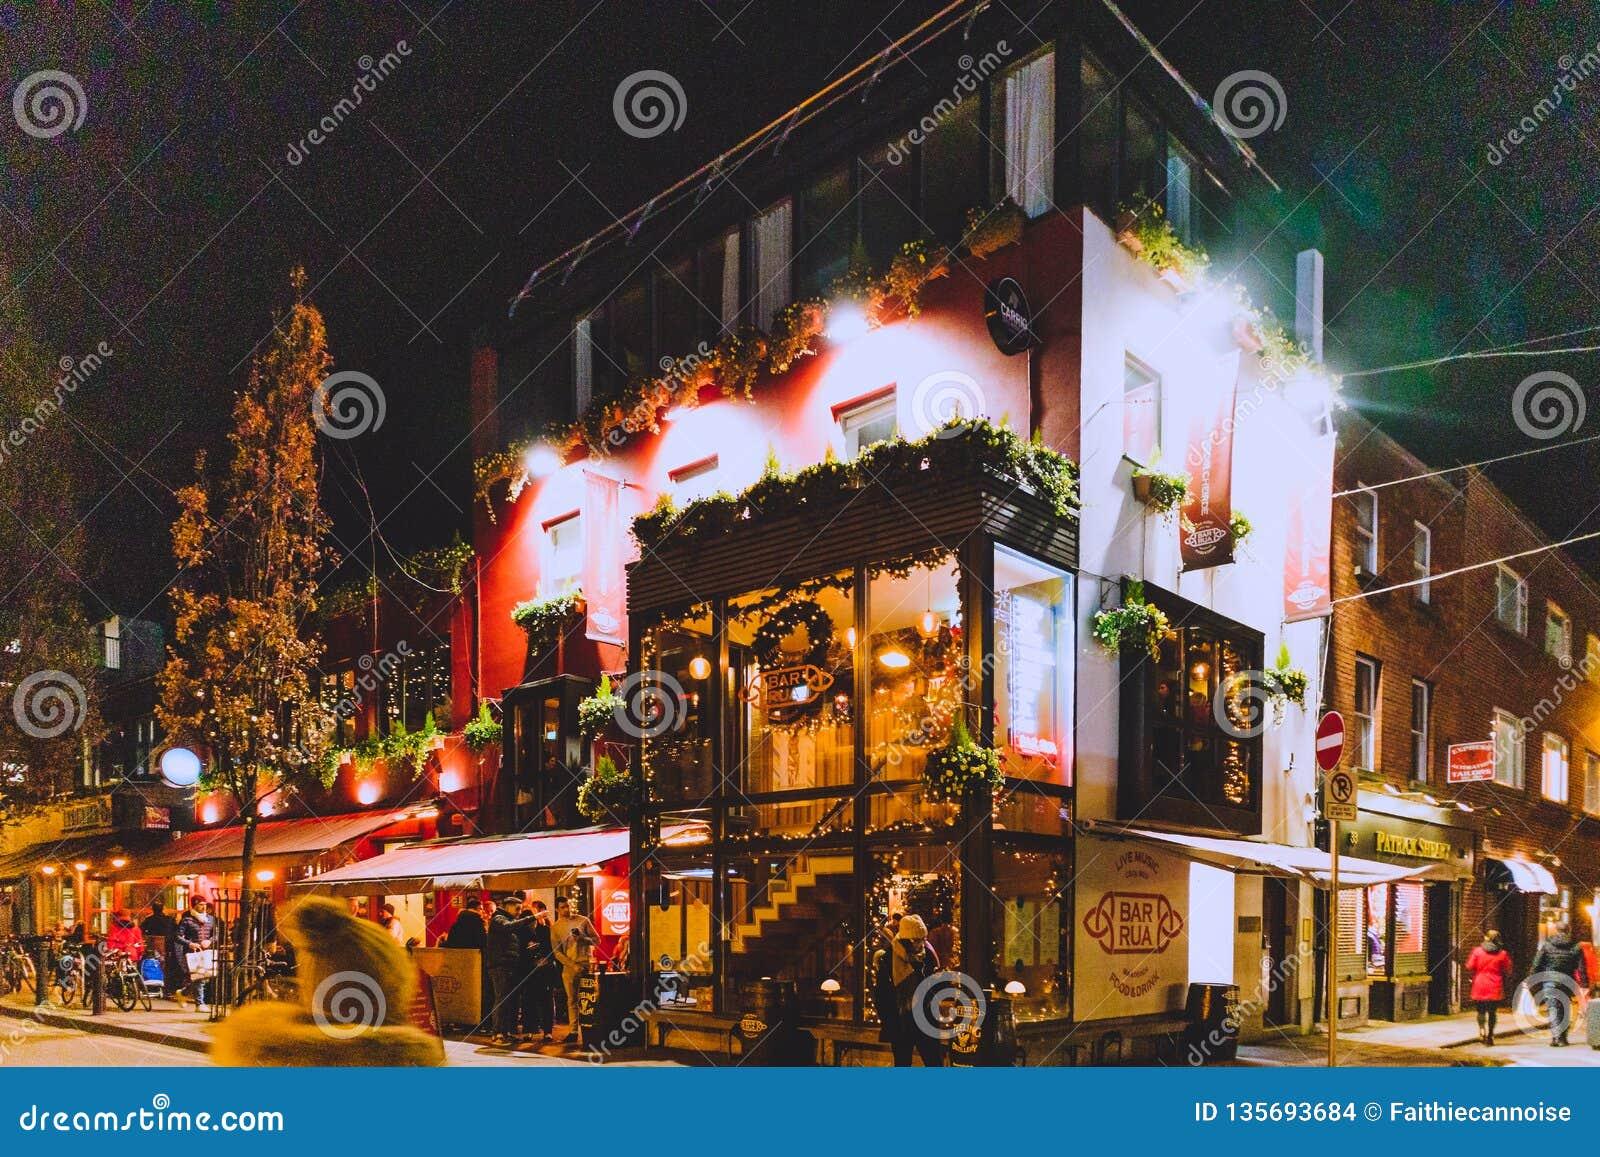 Christmas In Dublin Ireland.Irish Pub With Christmas Decorations In Dublin City Centre